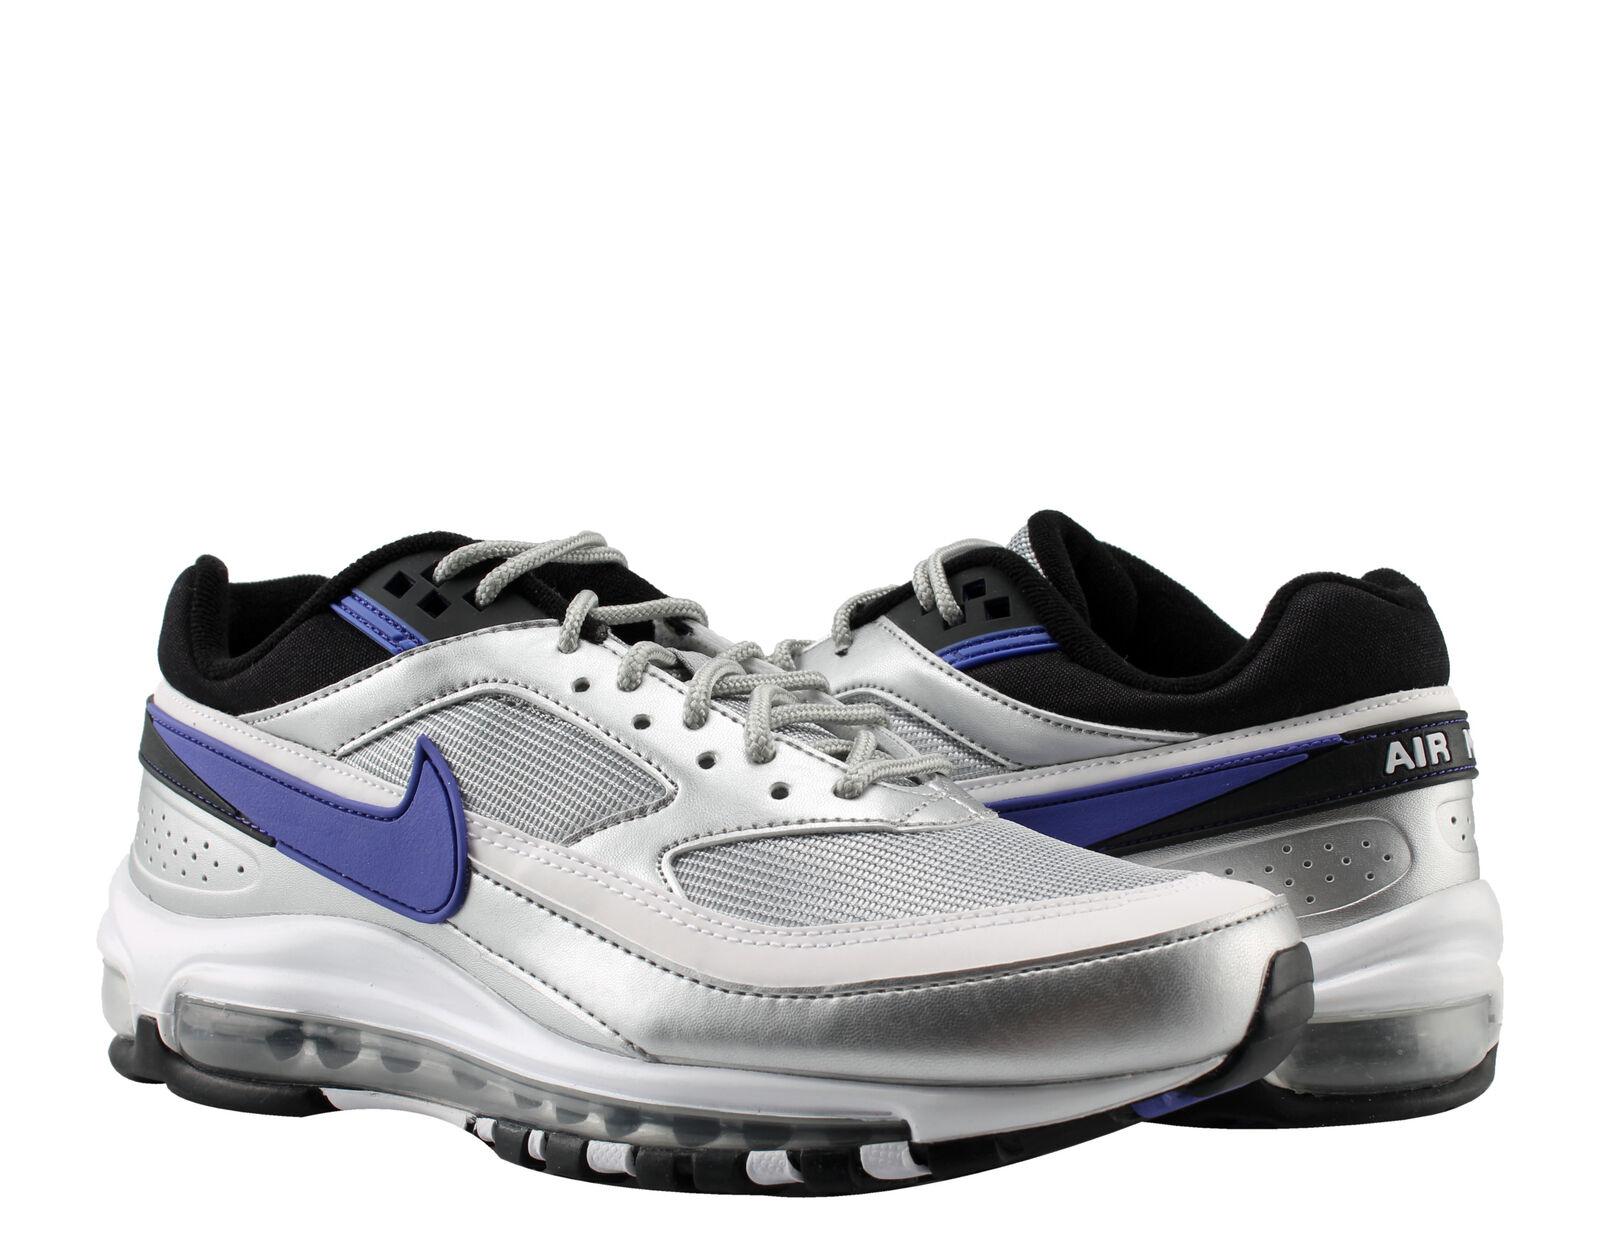 Nike Air Max 97 BW Persian purple Men's Running Running Running shoes AO2406-002 b88d89